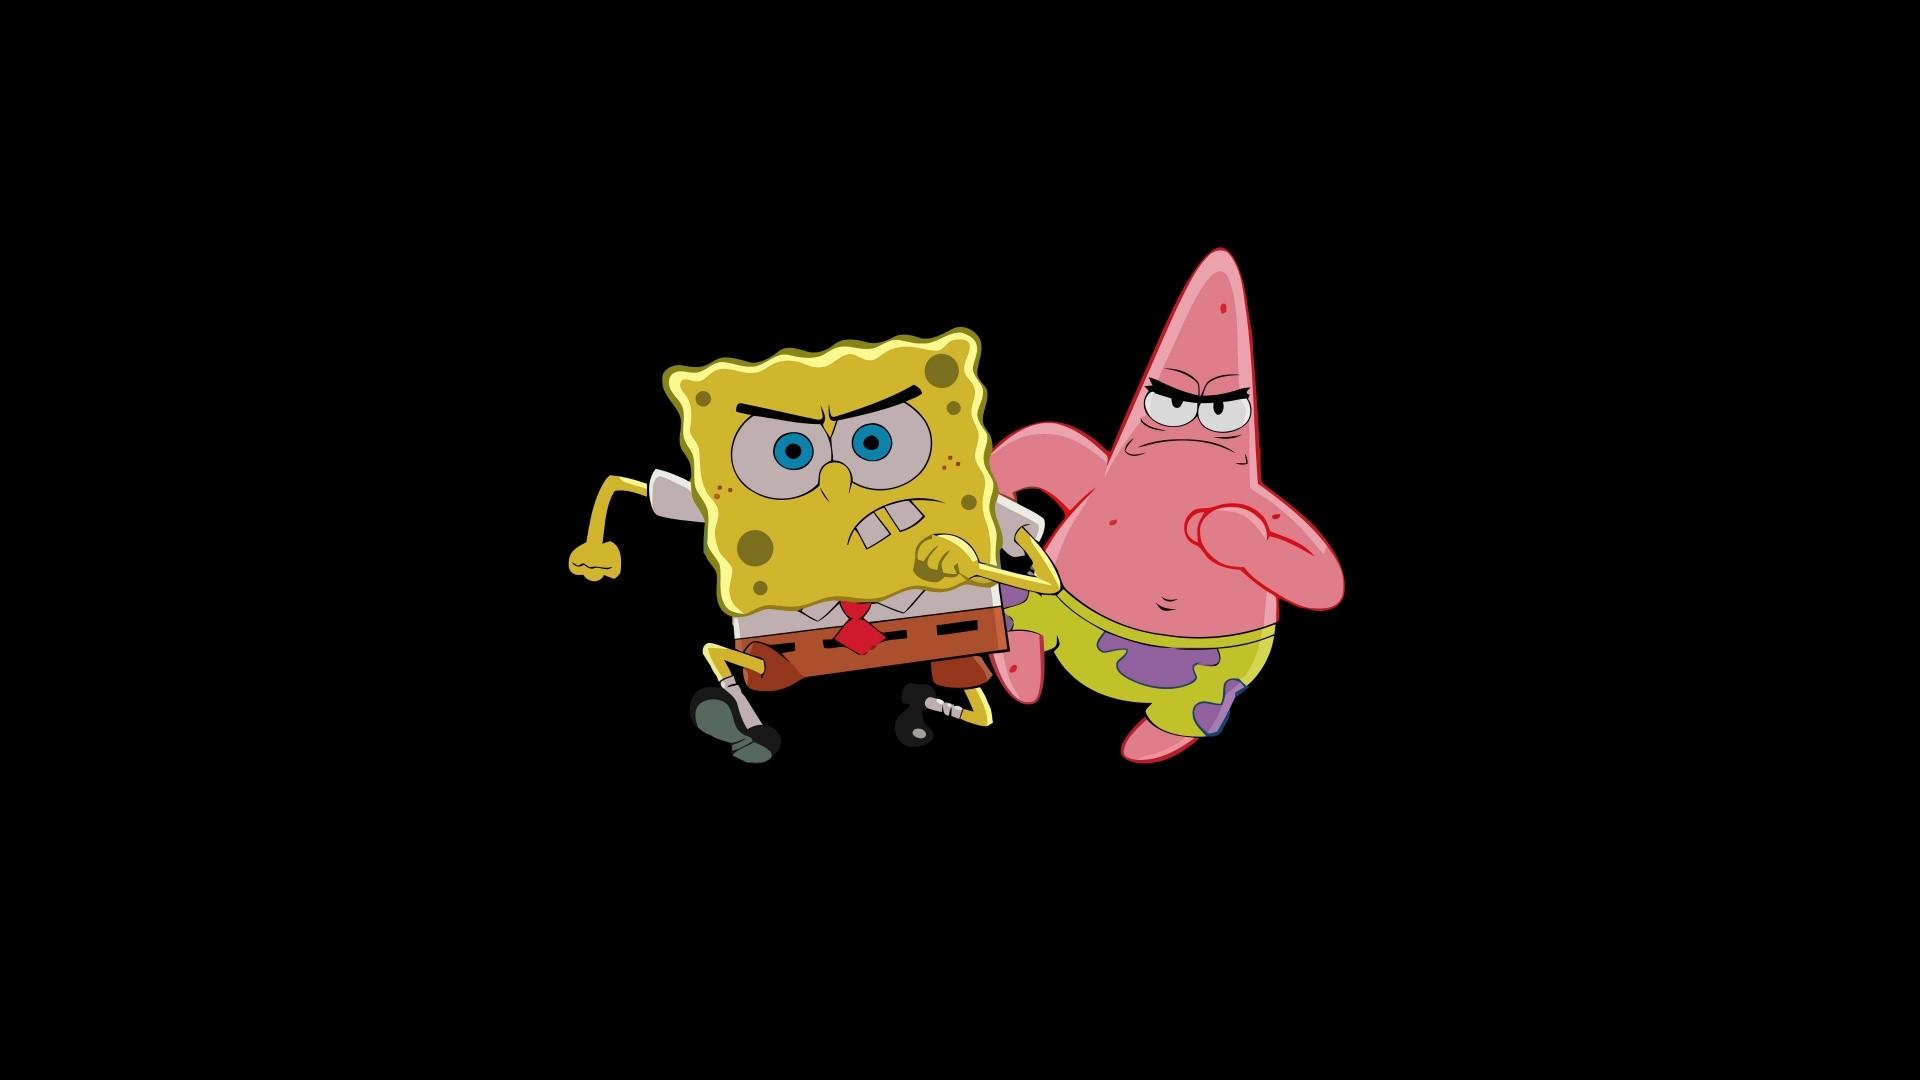 Spongebob And Patrick Wallpaper Desktop